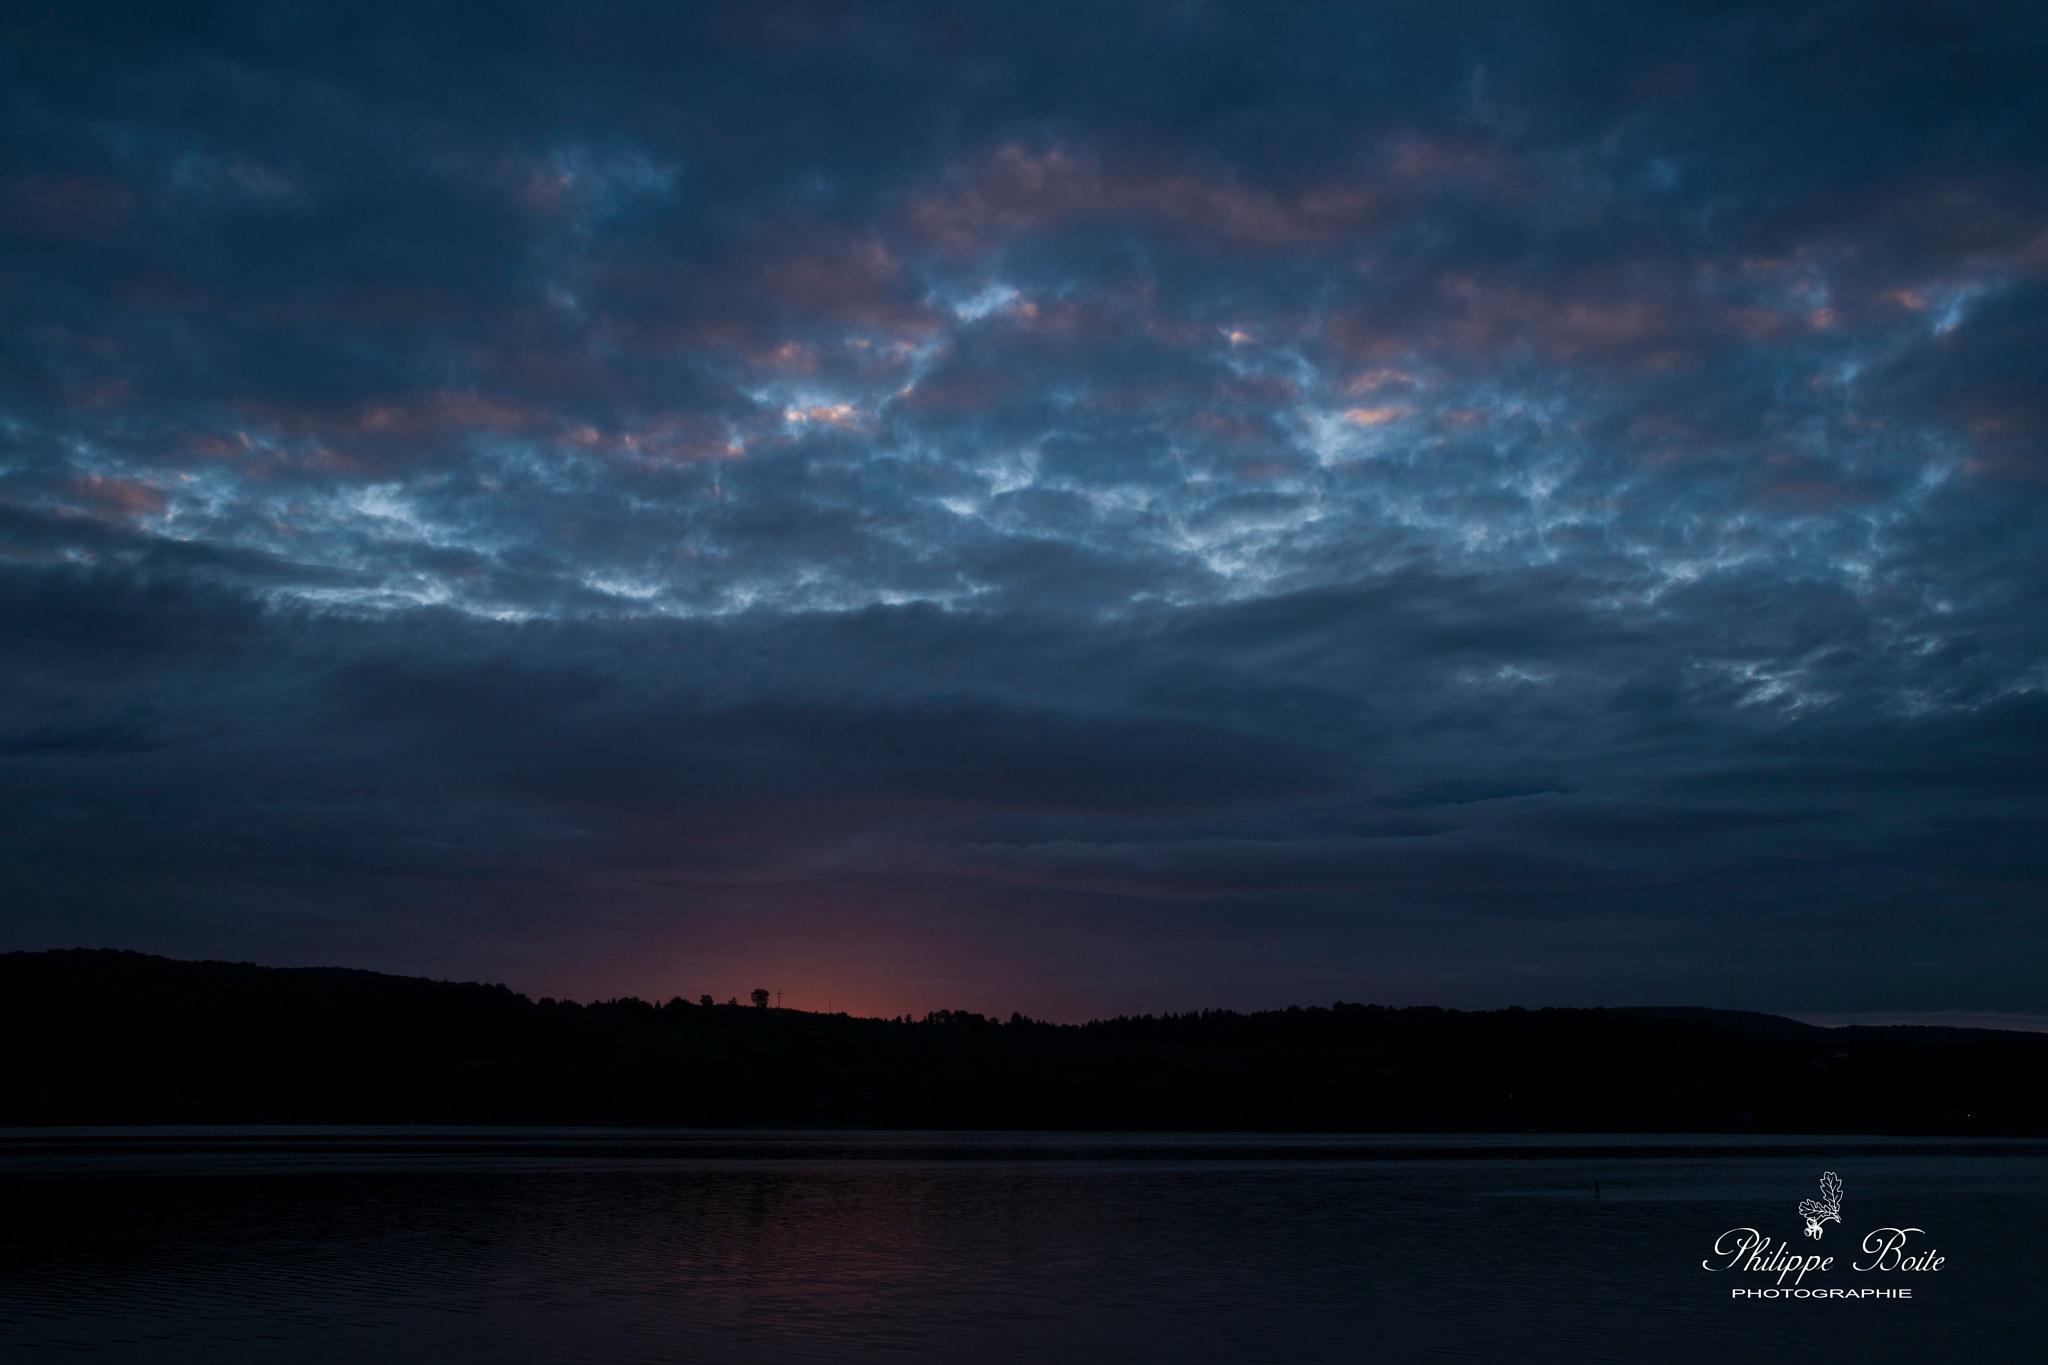 Dark dawn by Philippe Boite